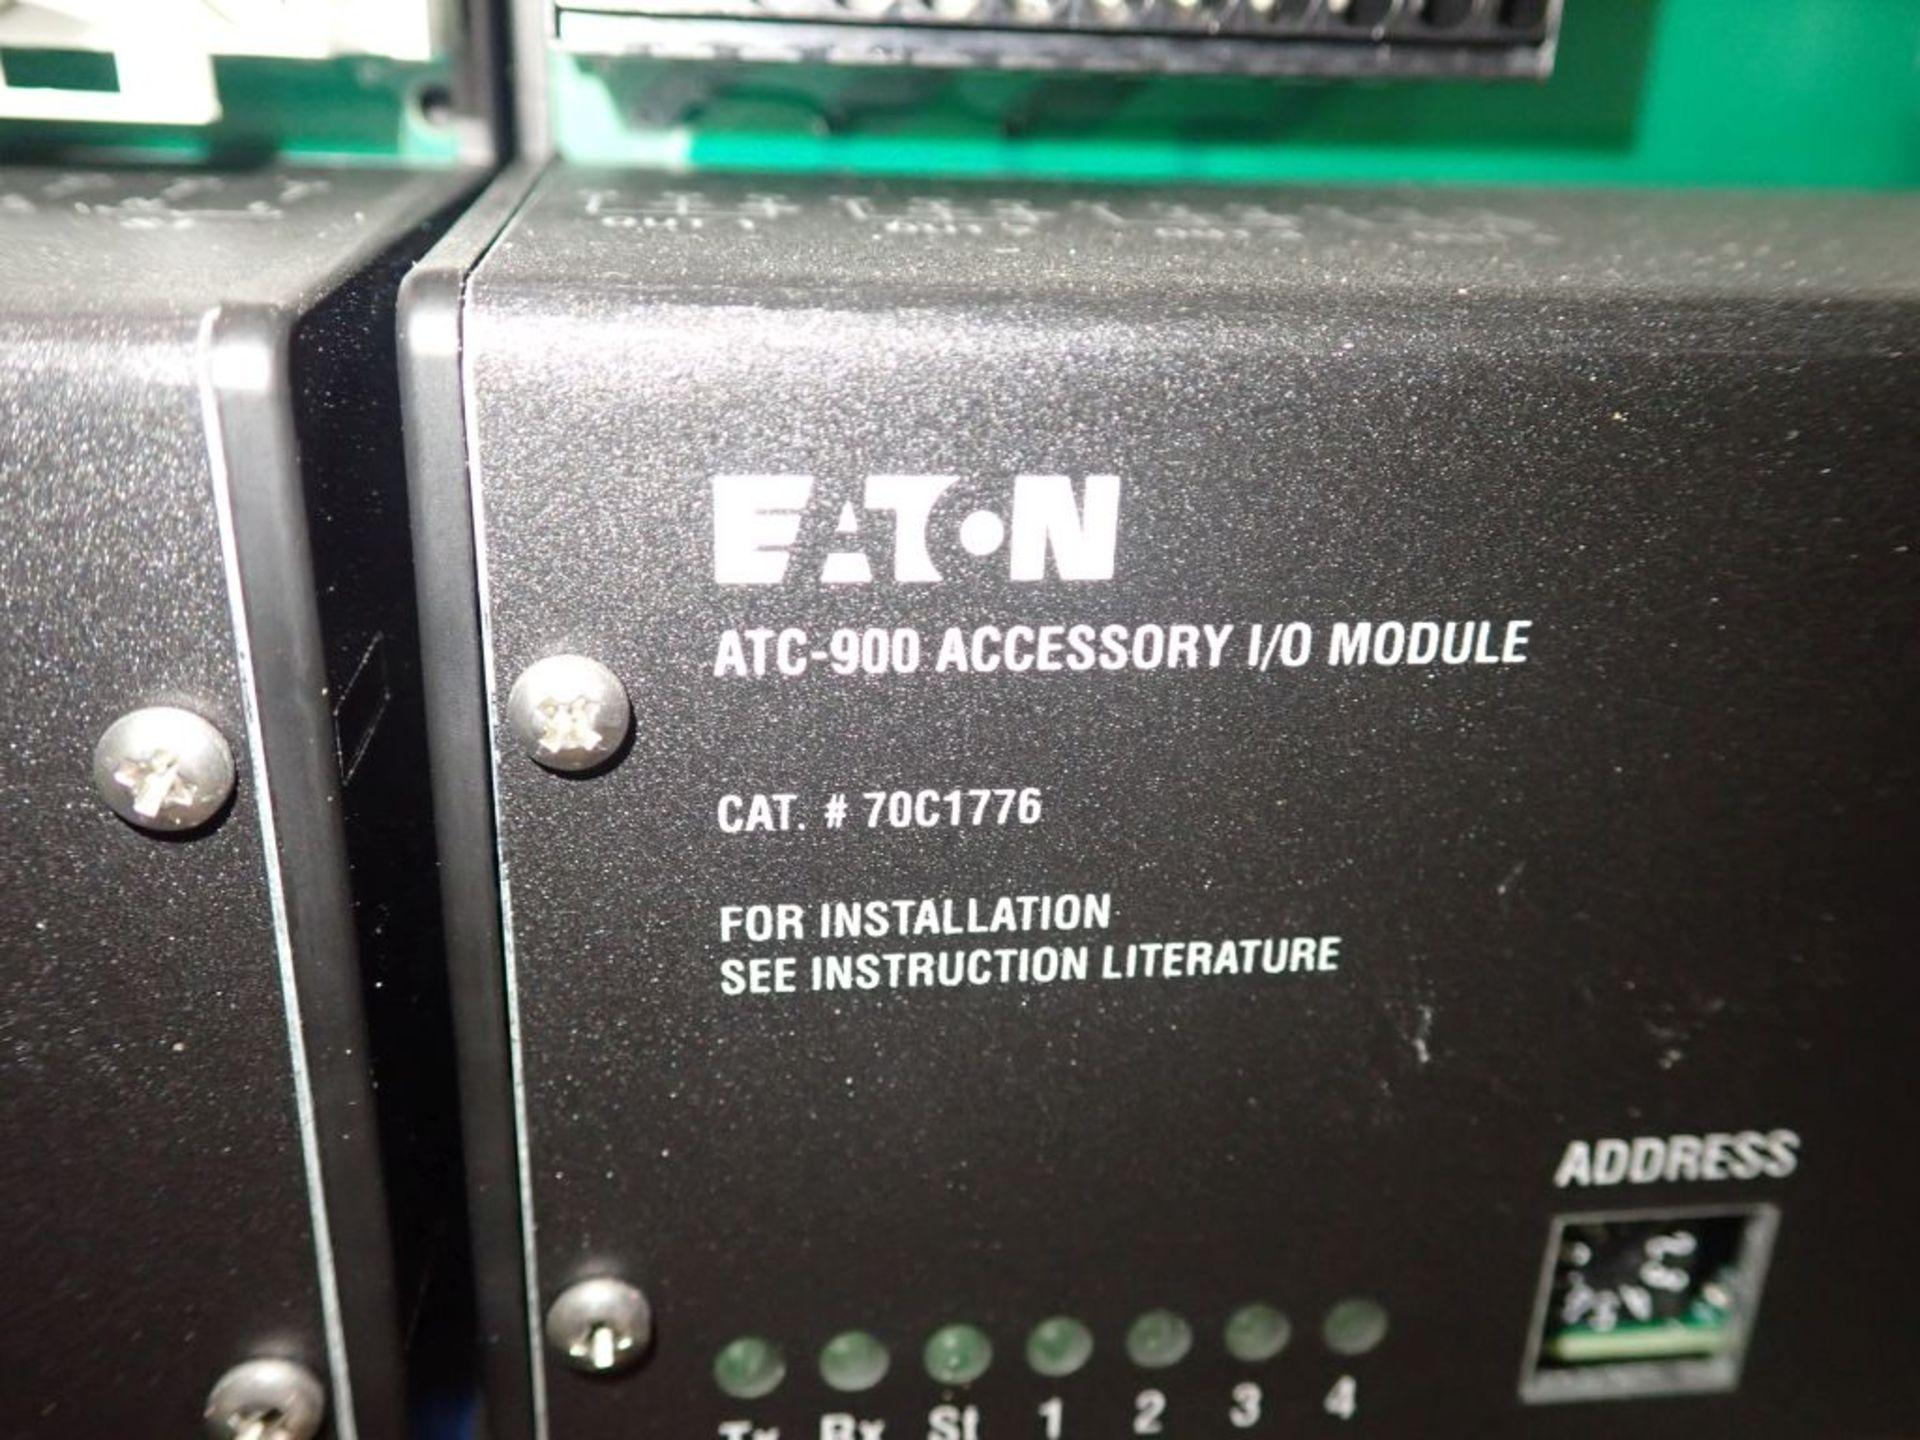 Eaton Transfer Switch | Cat No. ATV9MGB32500XSU; 480V; 3 PH; 2500A; (2) Eaton Magnum DS Circuit - Image 34 of 50